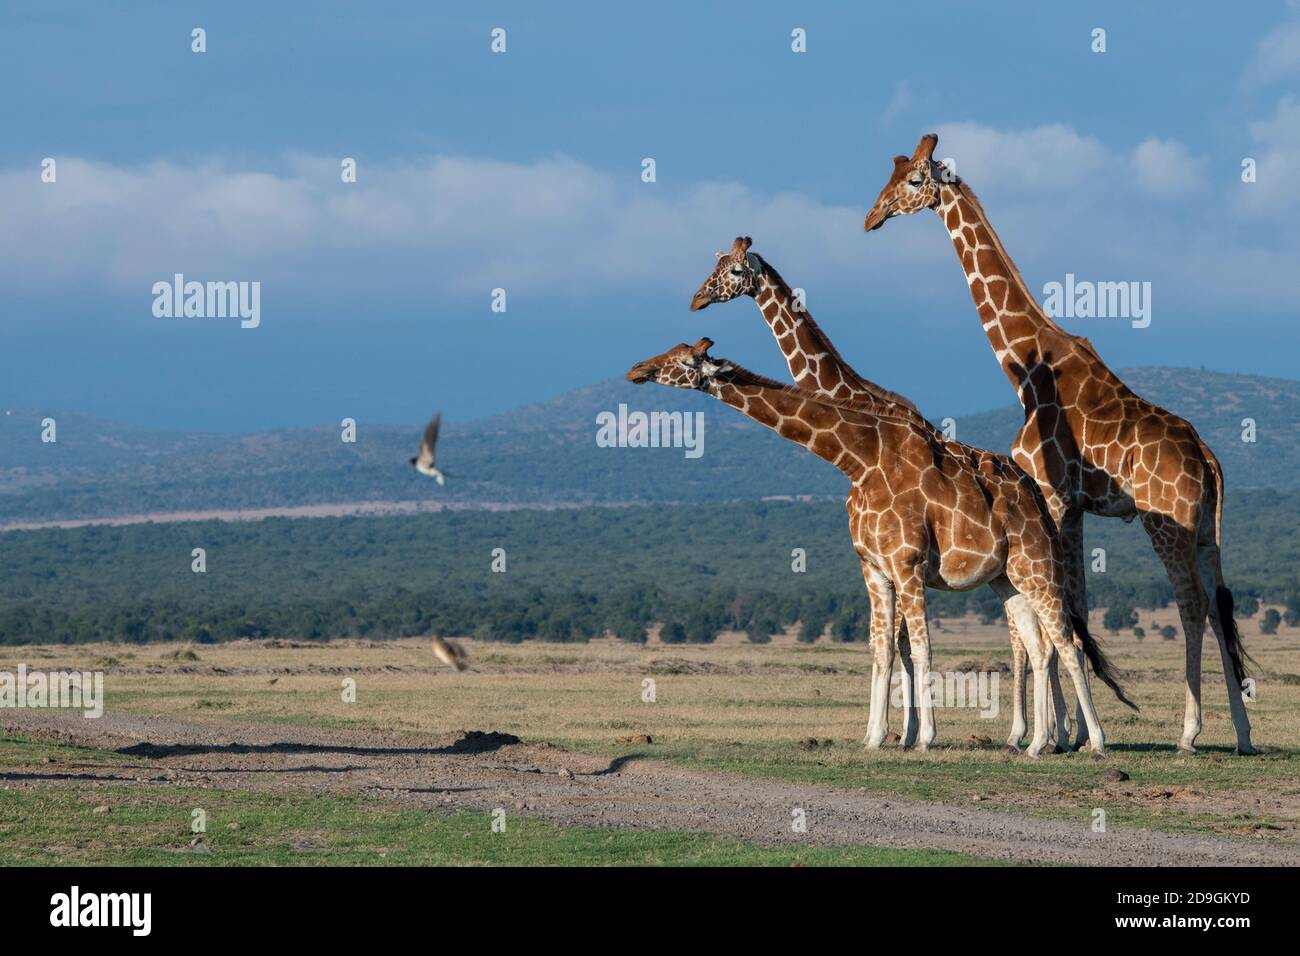 Africa, Kenya, Laikipia Plateau, Northern Frontier District, Ol Pejeta Conservancy. Reticulated giraffes (WILD: Giraffa camelopardalis reticulata) Stock Photo